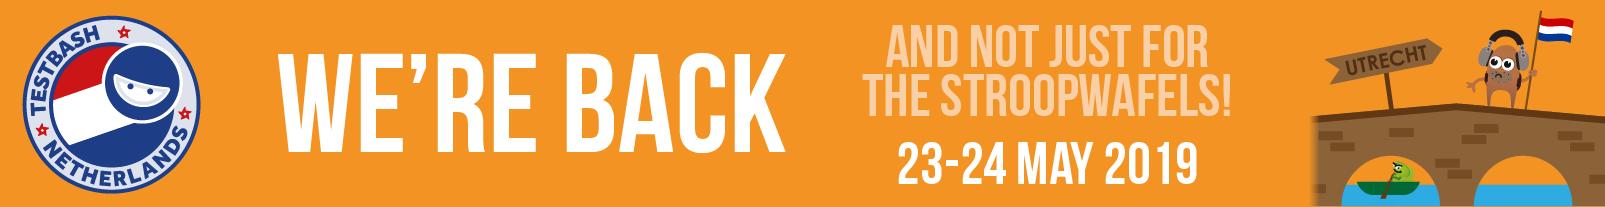 Testbash nl 2019 adverts dojo event banner